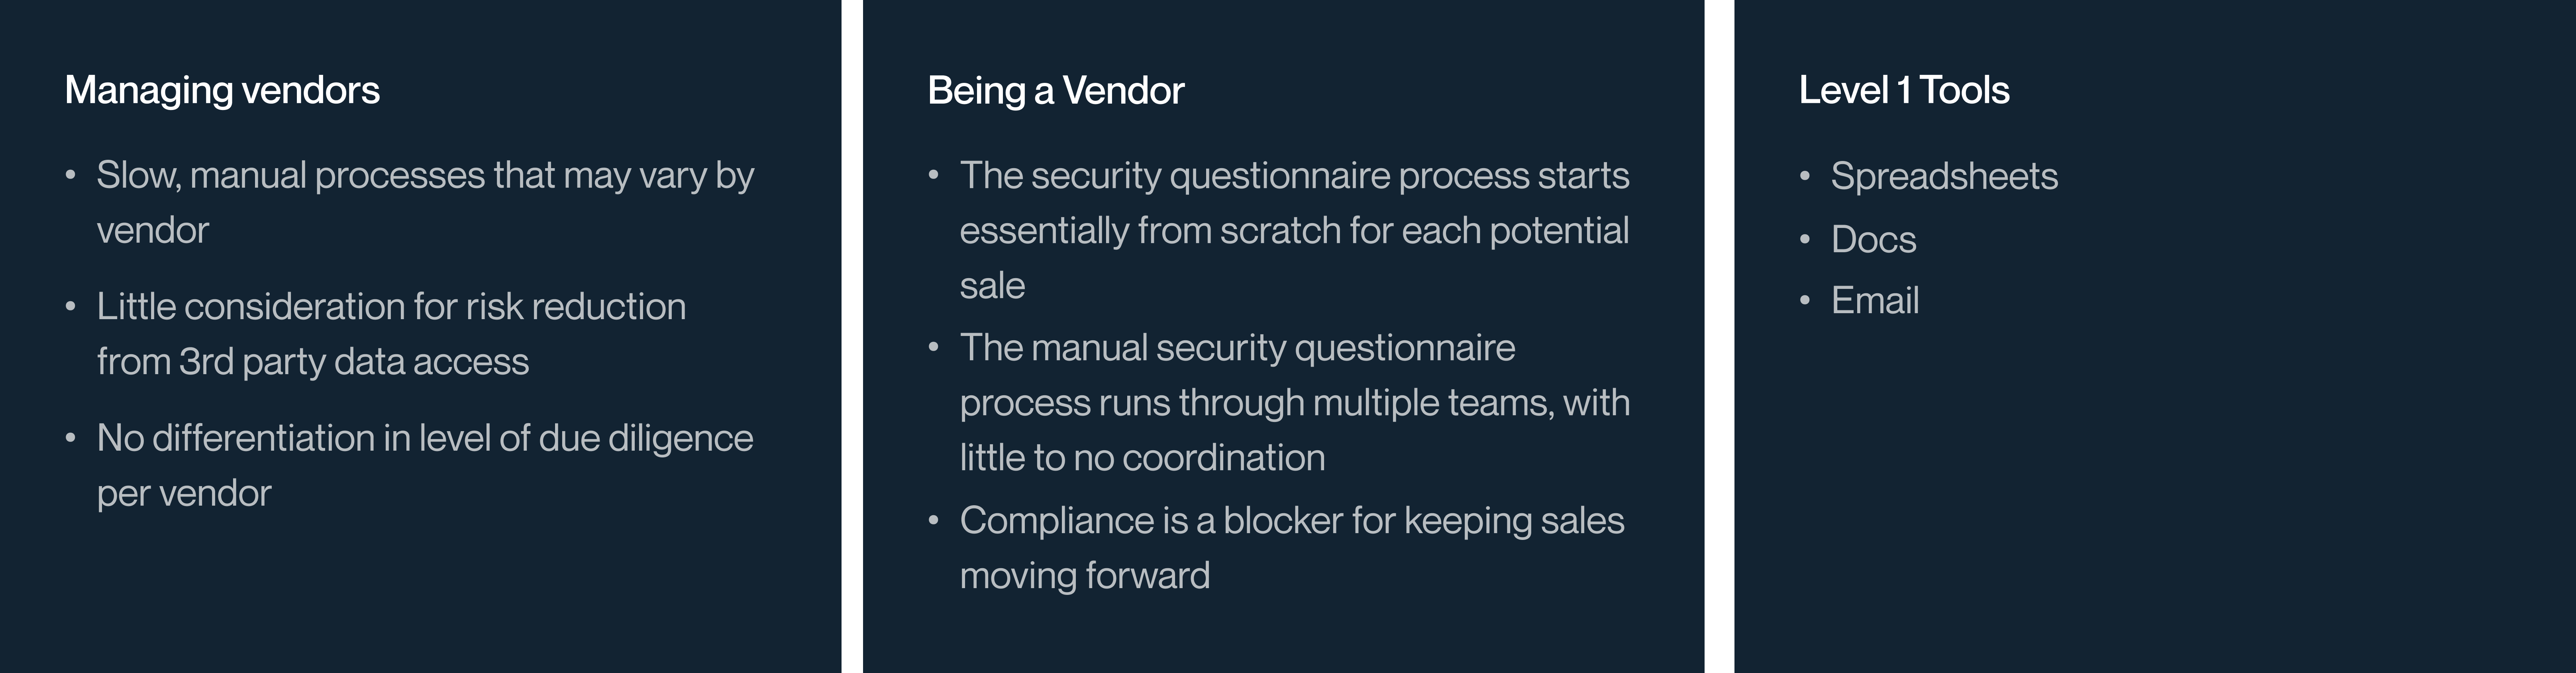 Vendor Management at Level 1